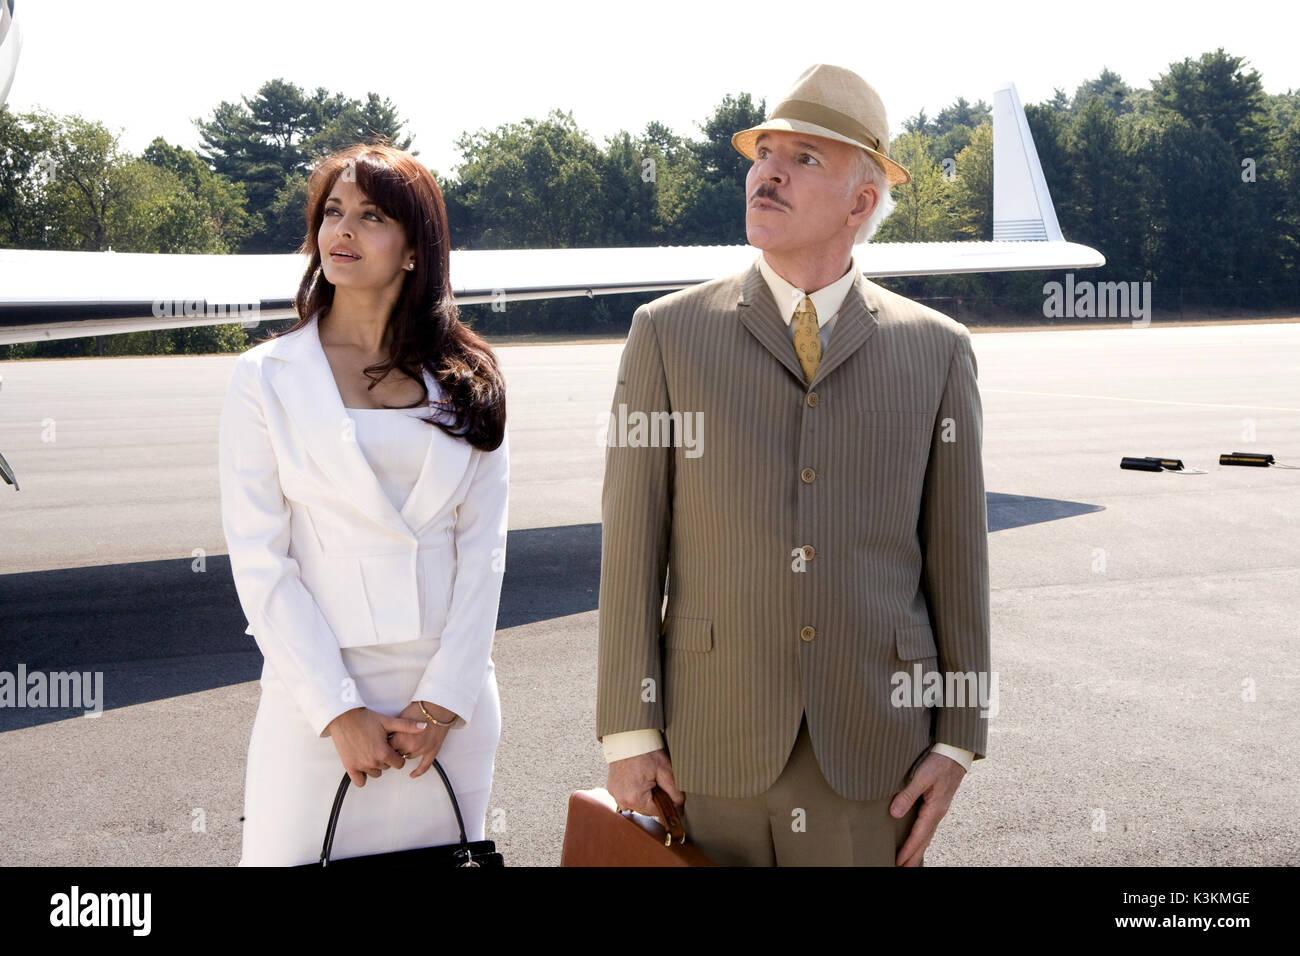 La Pantera Rosa 2 Aishwarya Rai Steve Martin Come Ispettore Clouseau Data 2009 Foto Stock Alamy